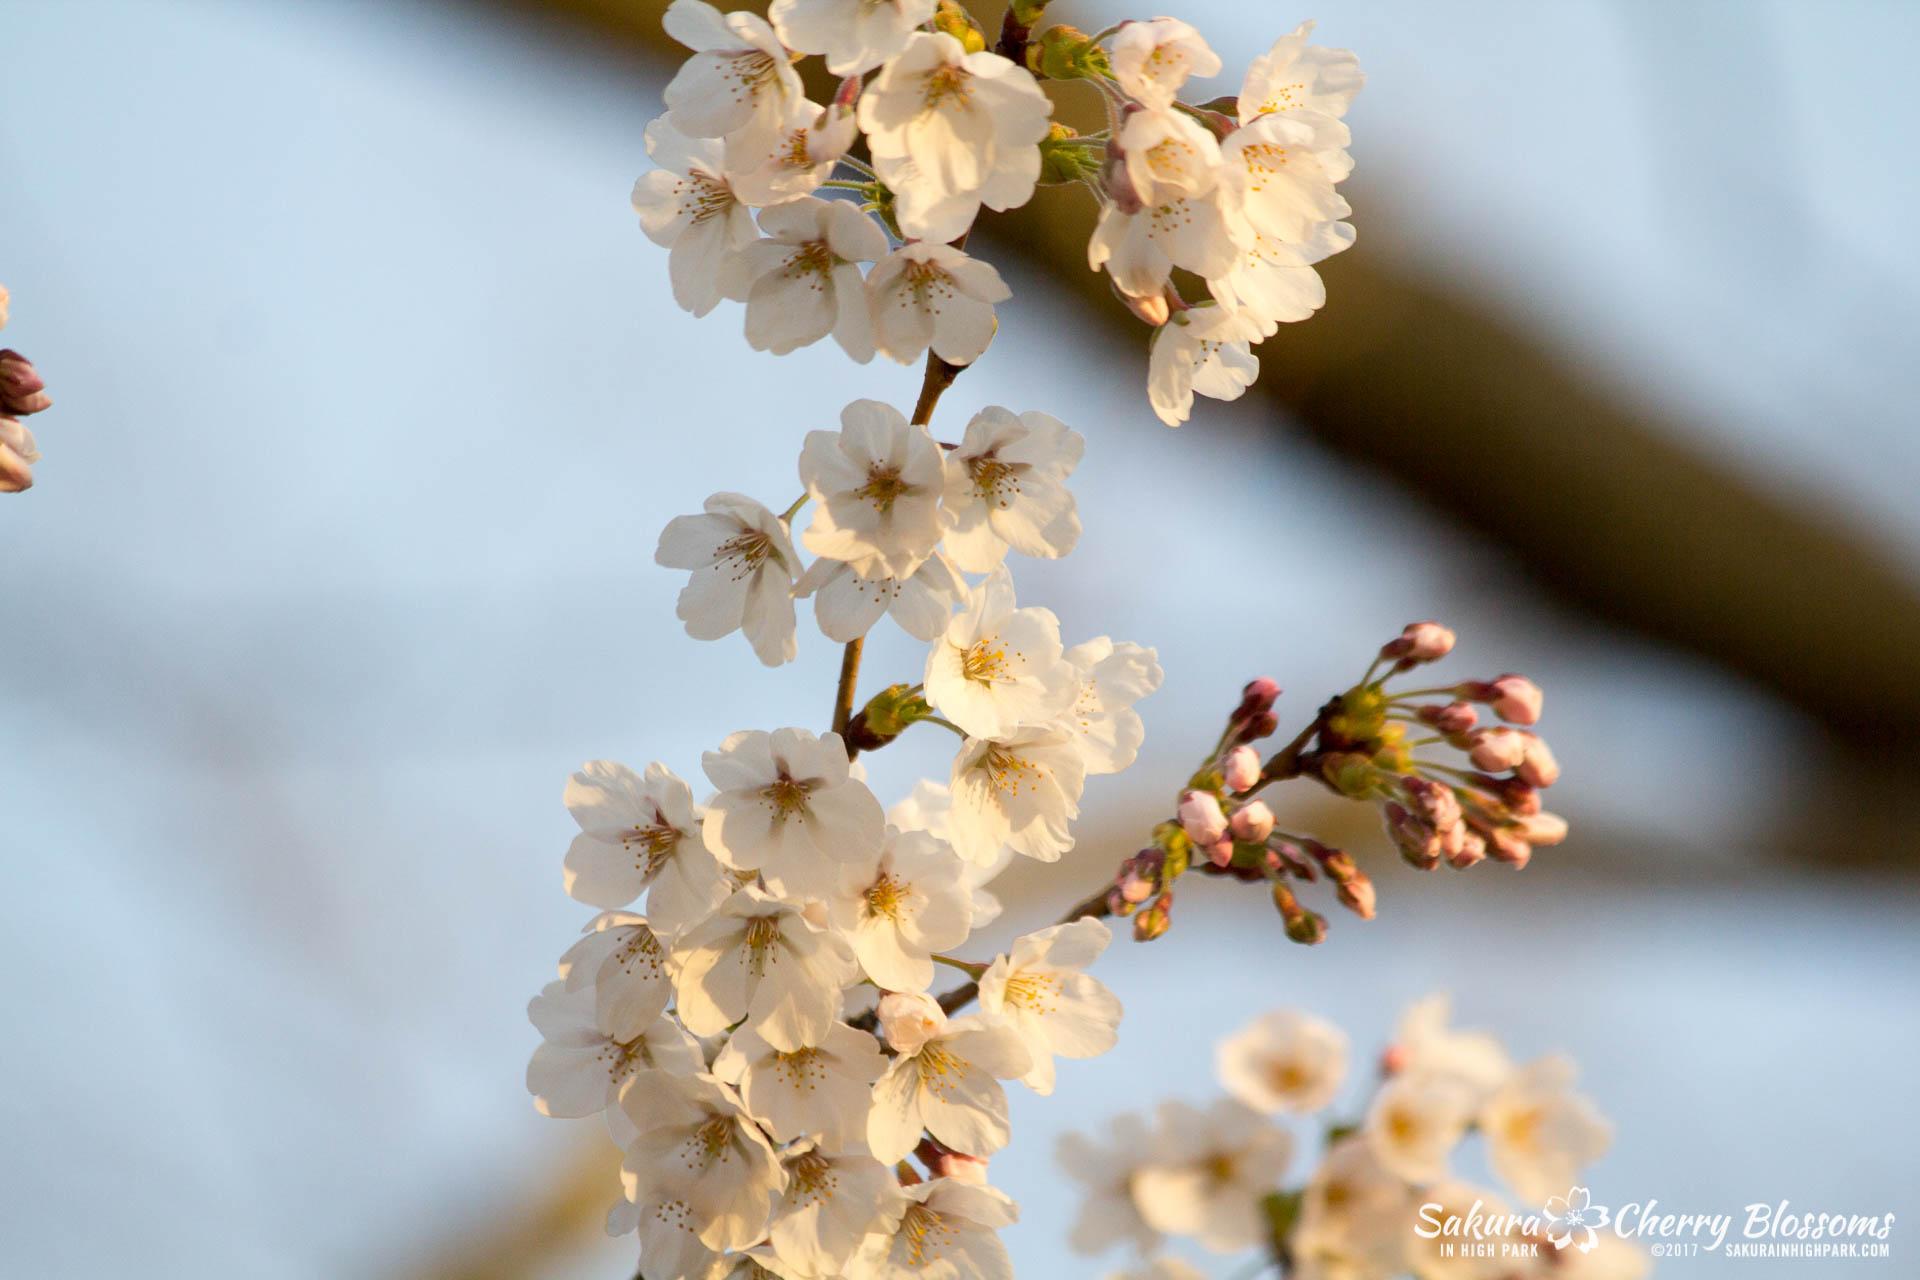 Sakura-Watch-April-24-2017-bloom-has-begun-with-more-to-come-130.jpg